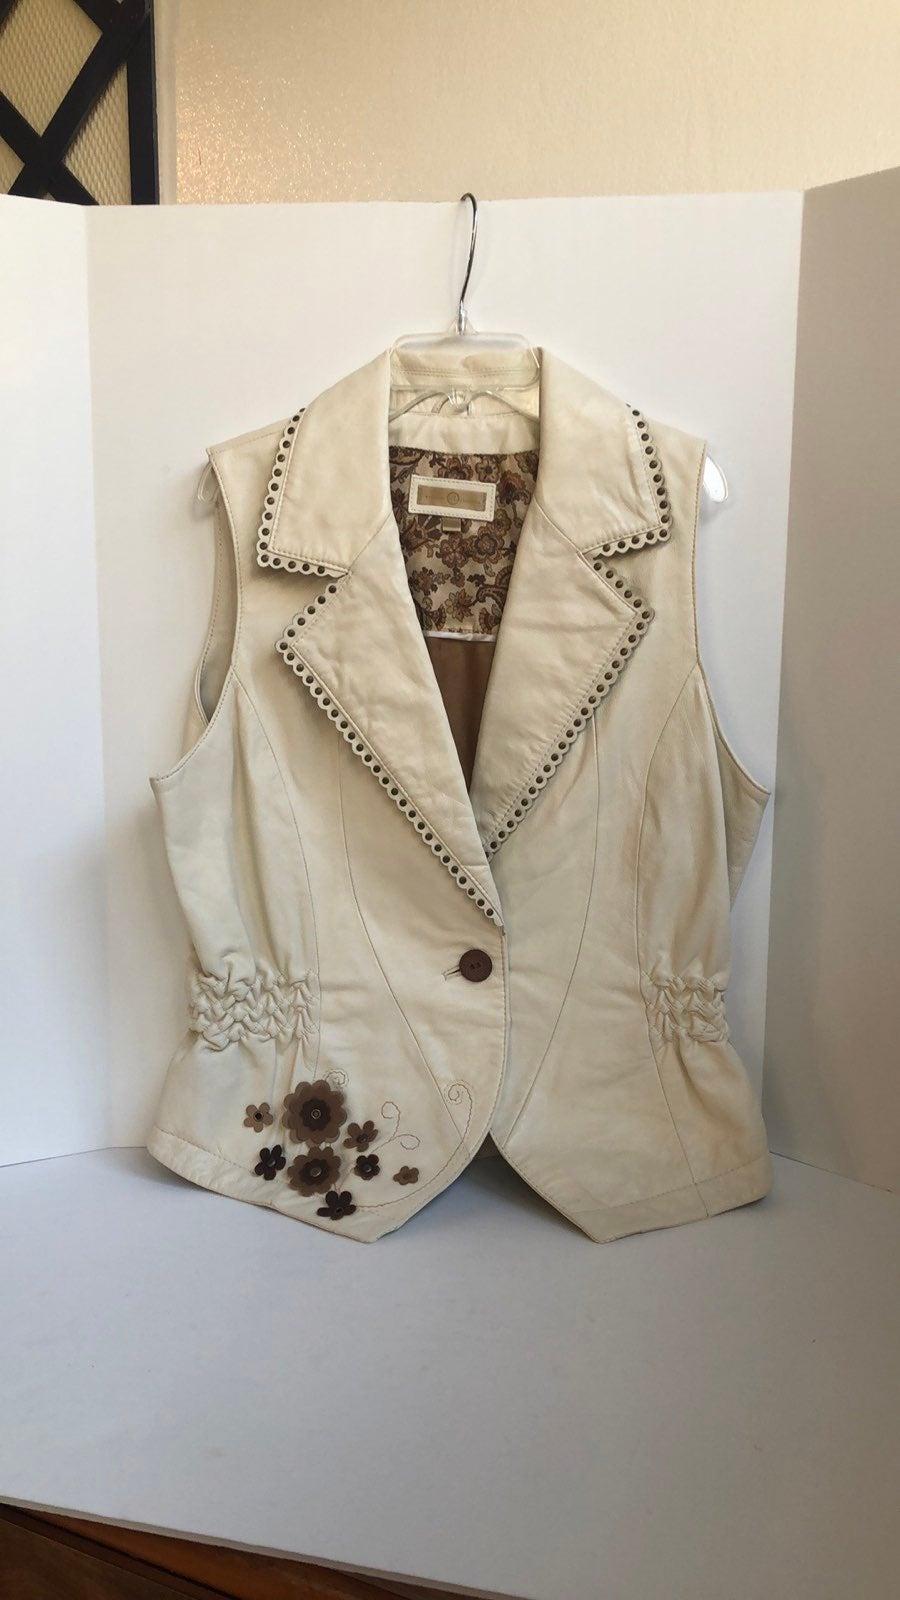 Wilson leather studded collar vest